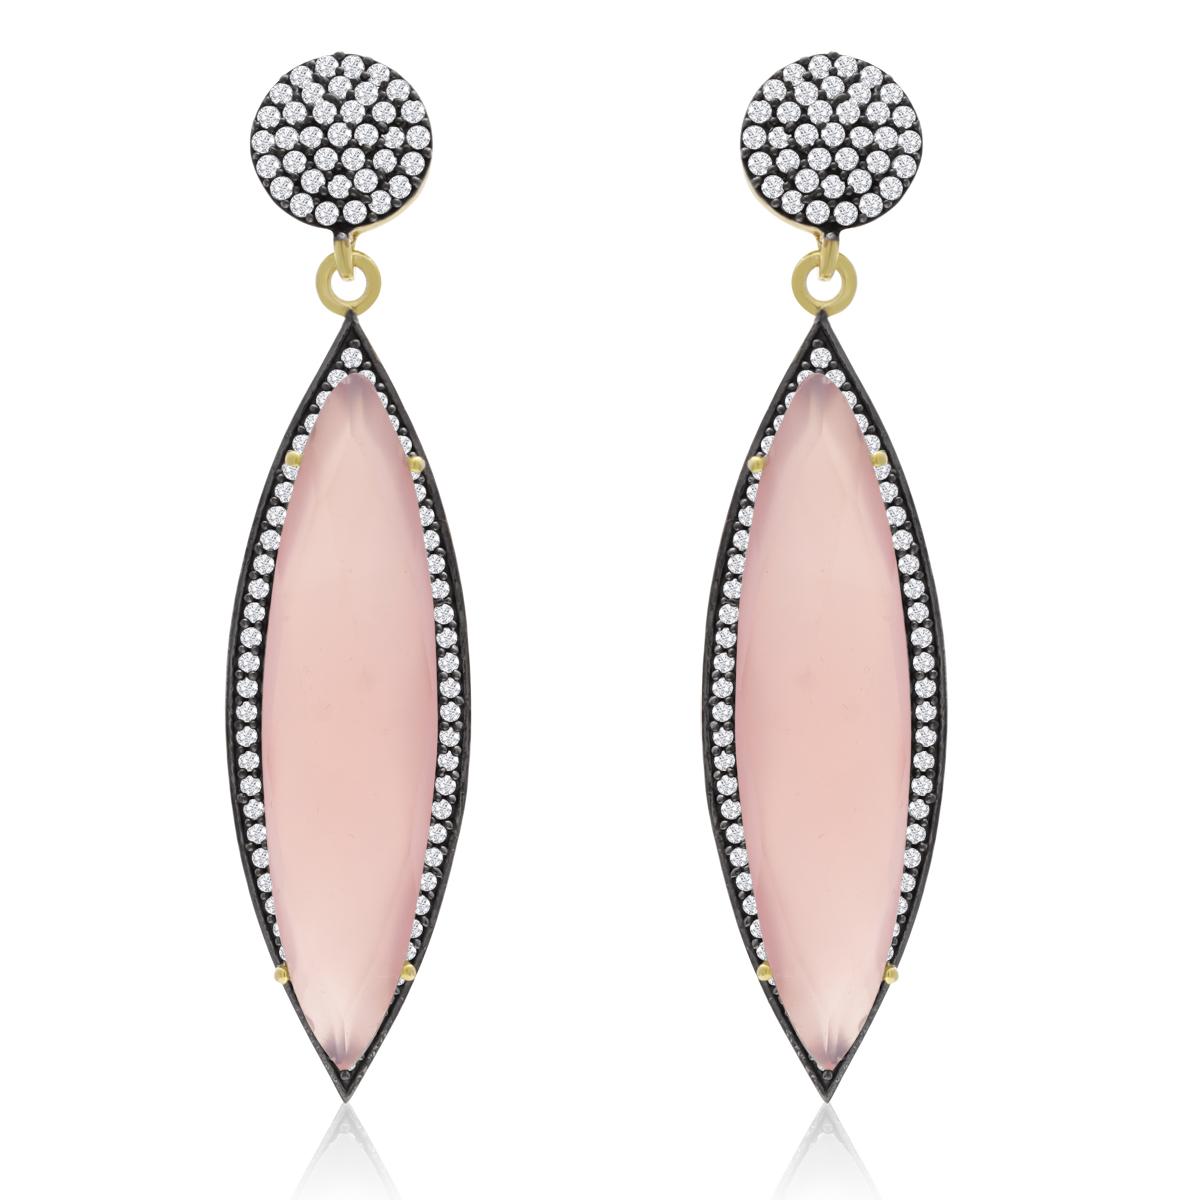 14k Yellow Gold 36ct Free Form Rose Quartz Earrings